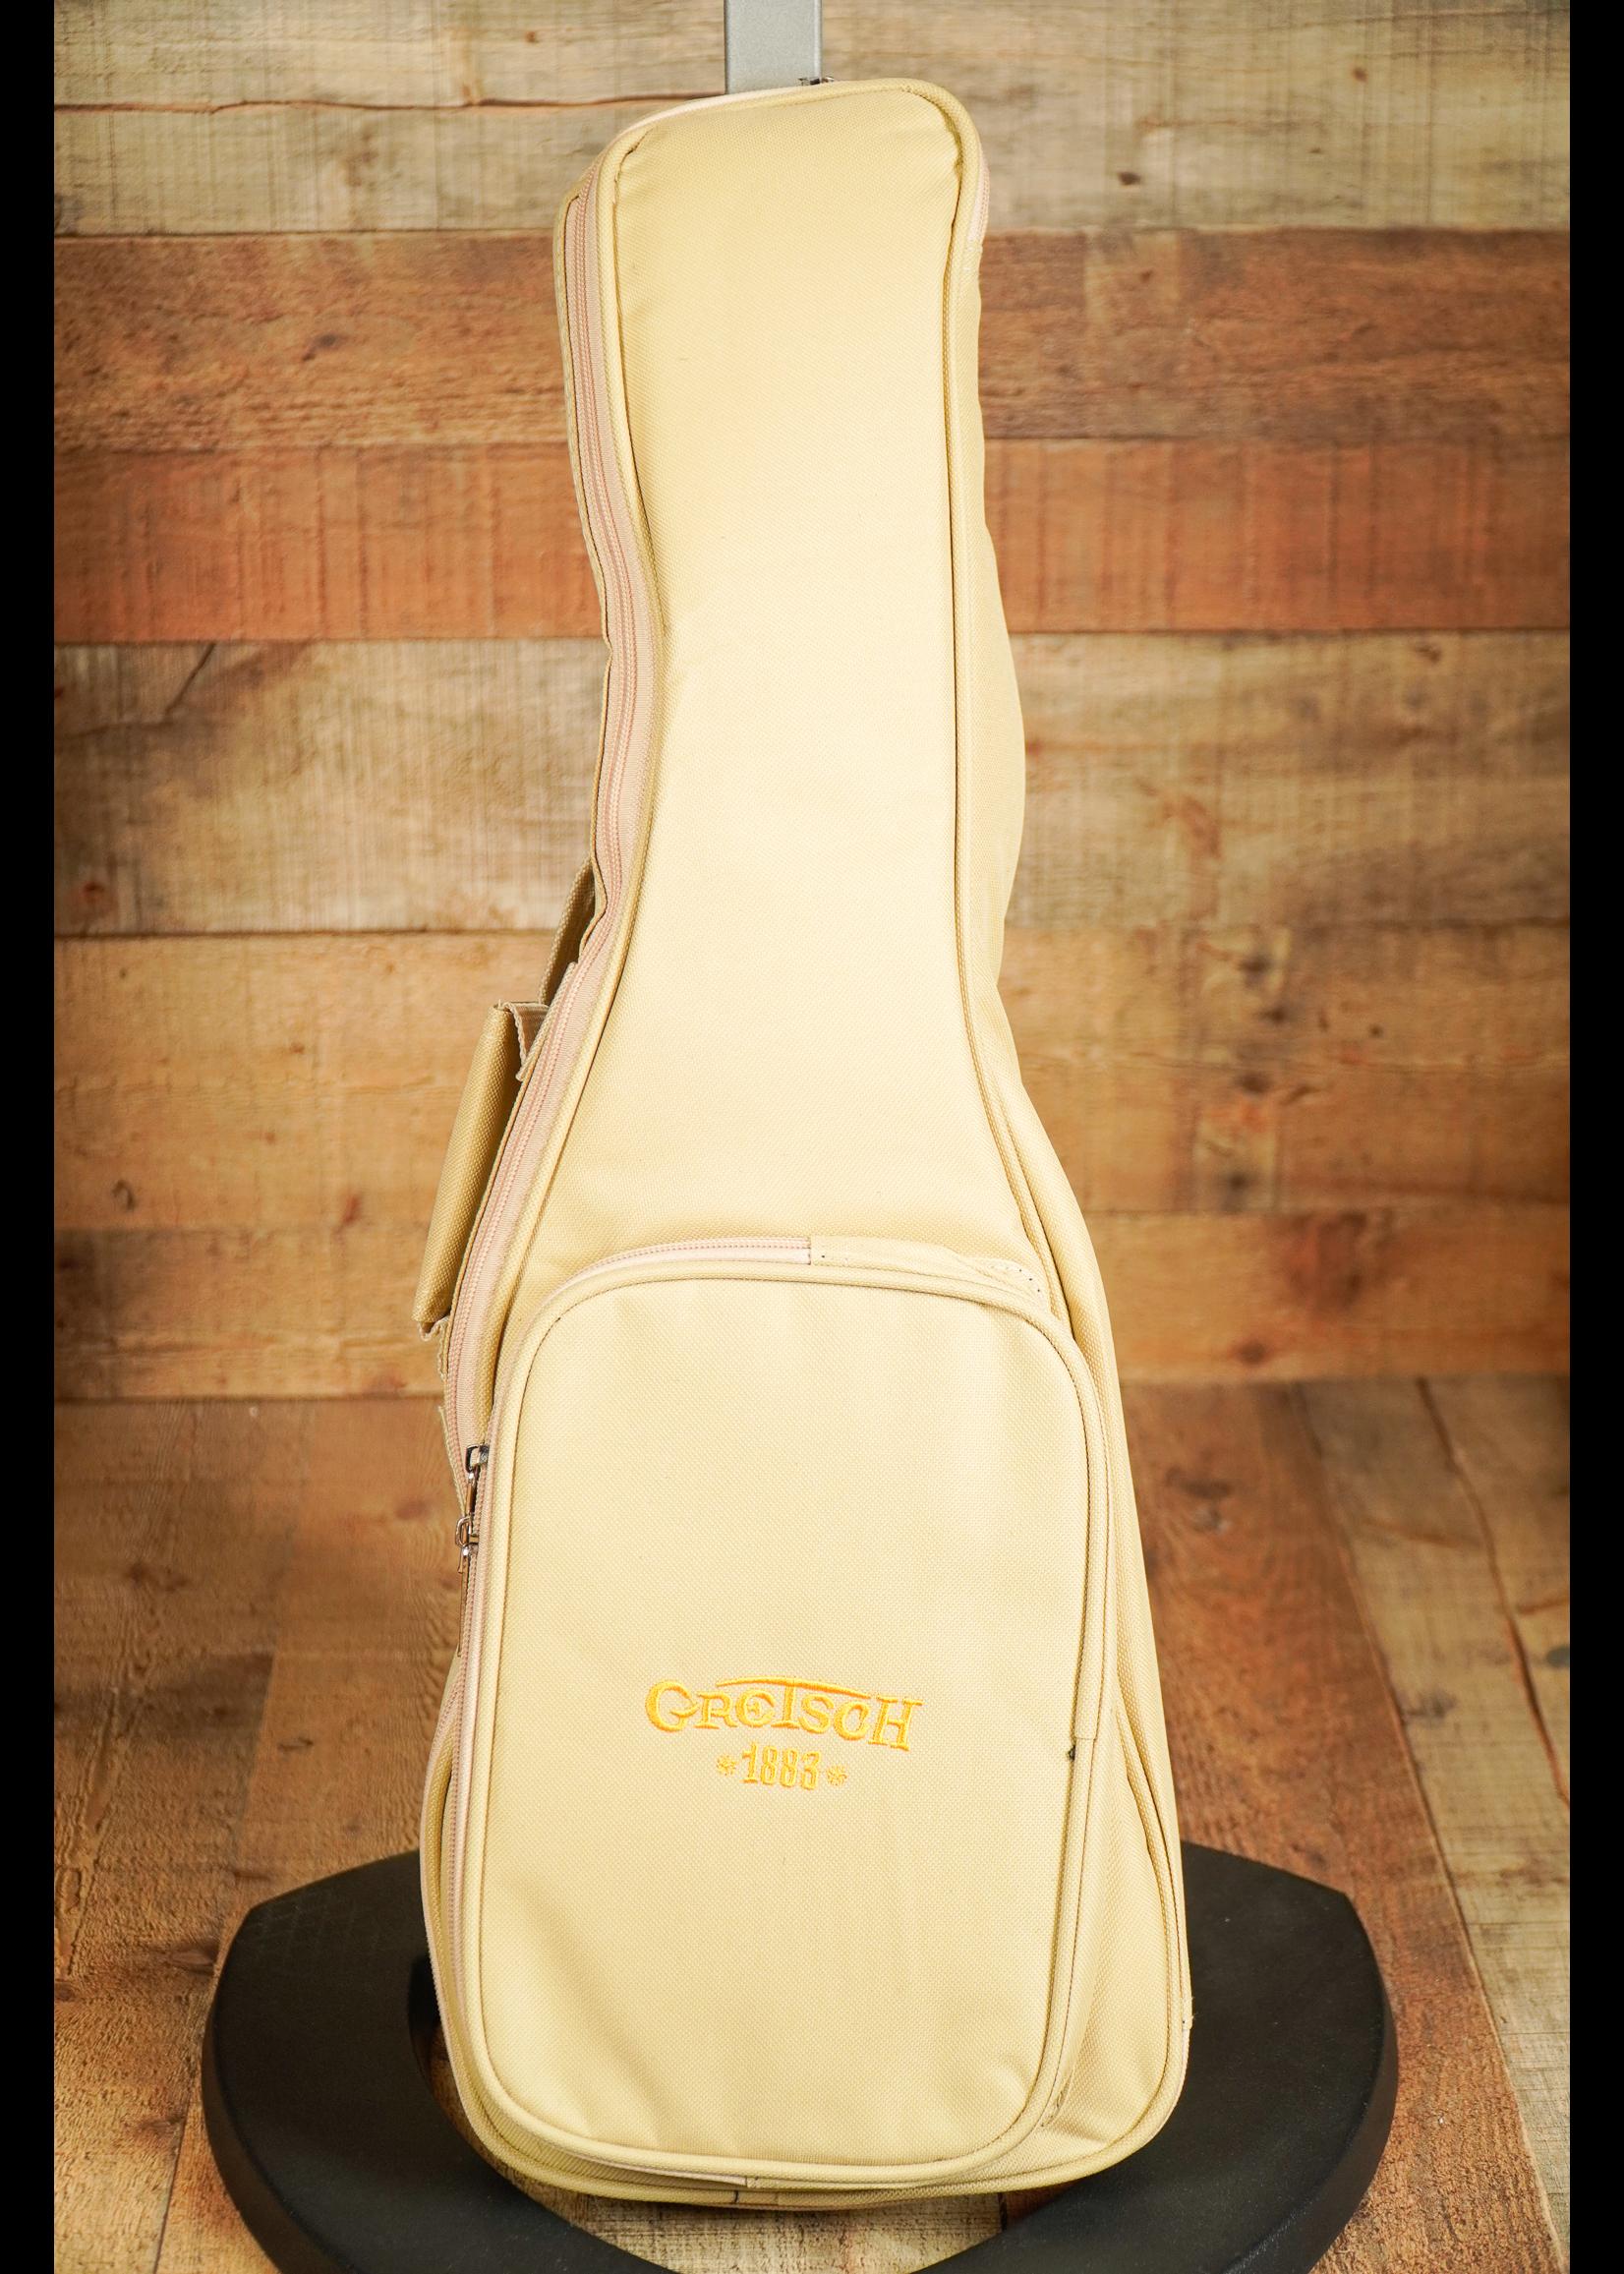 Gretsch Gretsch G9112 Resonator-Ukulele with Gig Bag, Ovangkol Fingerboard, Biscuit Cone, Honey Mahogany Stain